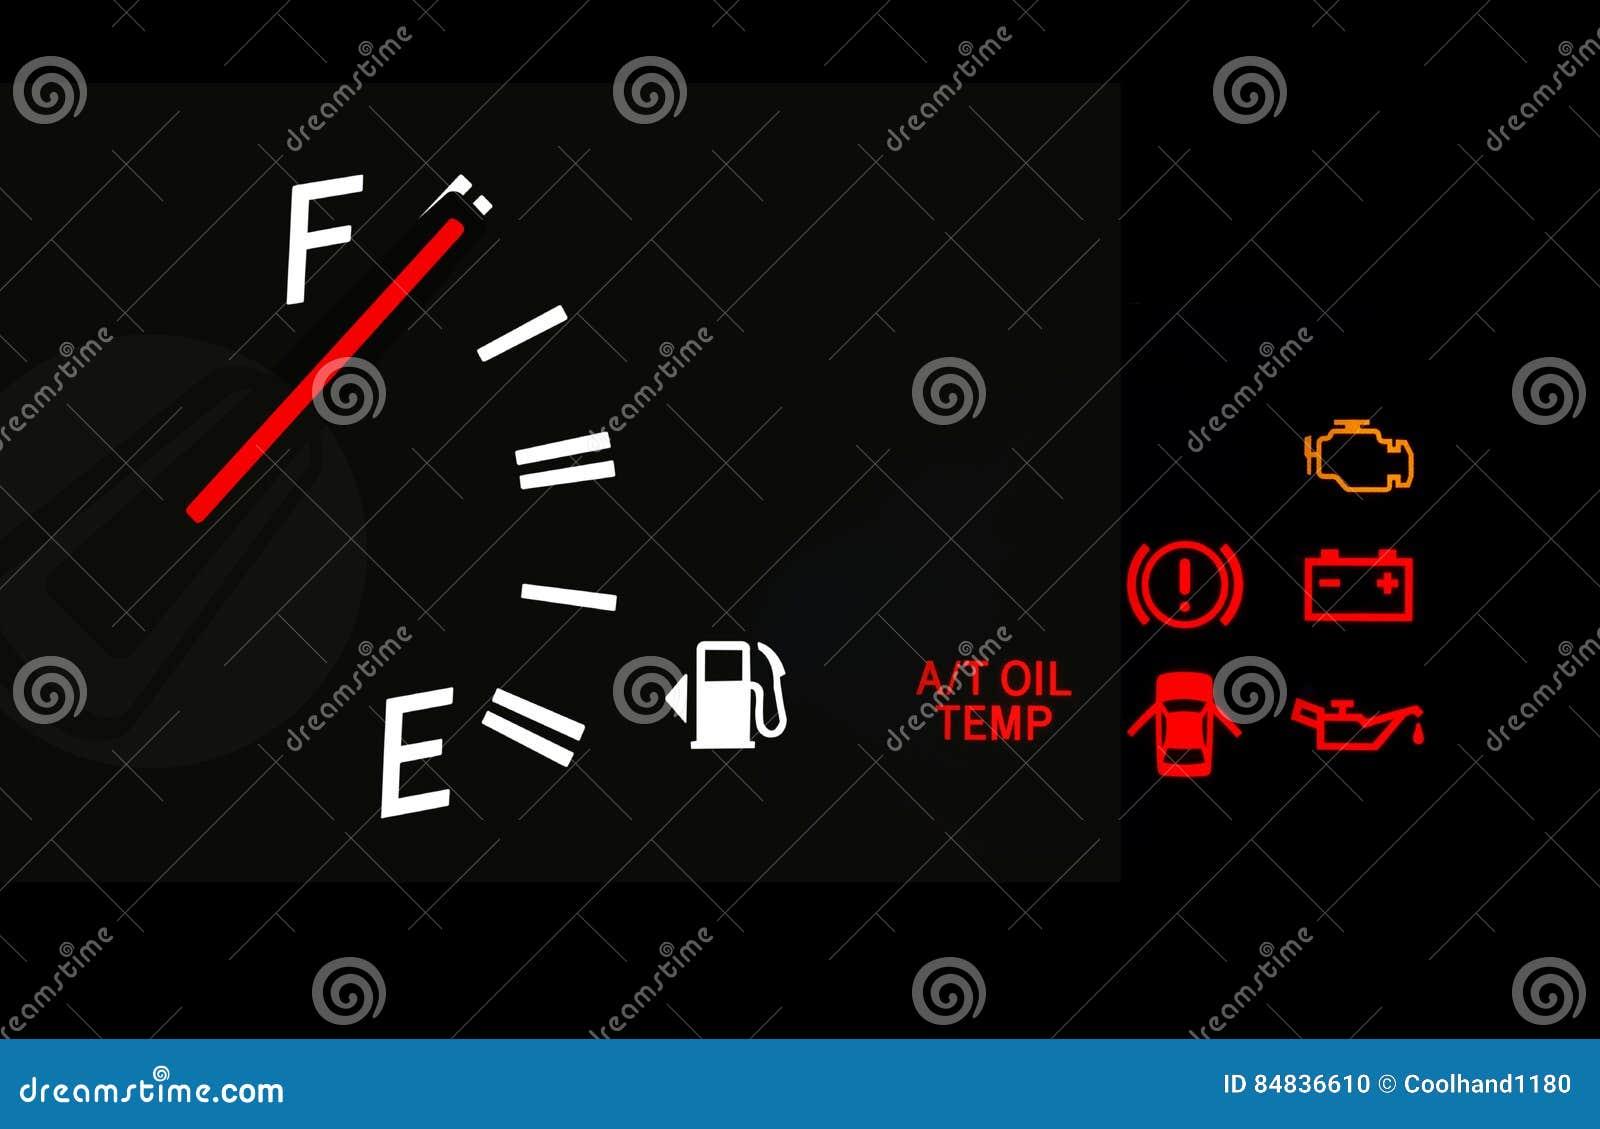 Fuel Gauge And Car Dashboard Signs Stock Photo Image Of Design - Car image sign of dashboarddashboard warning lights stock images royaltyfree images